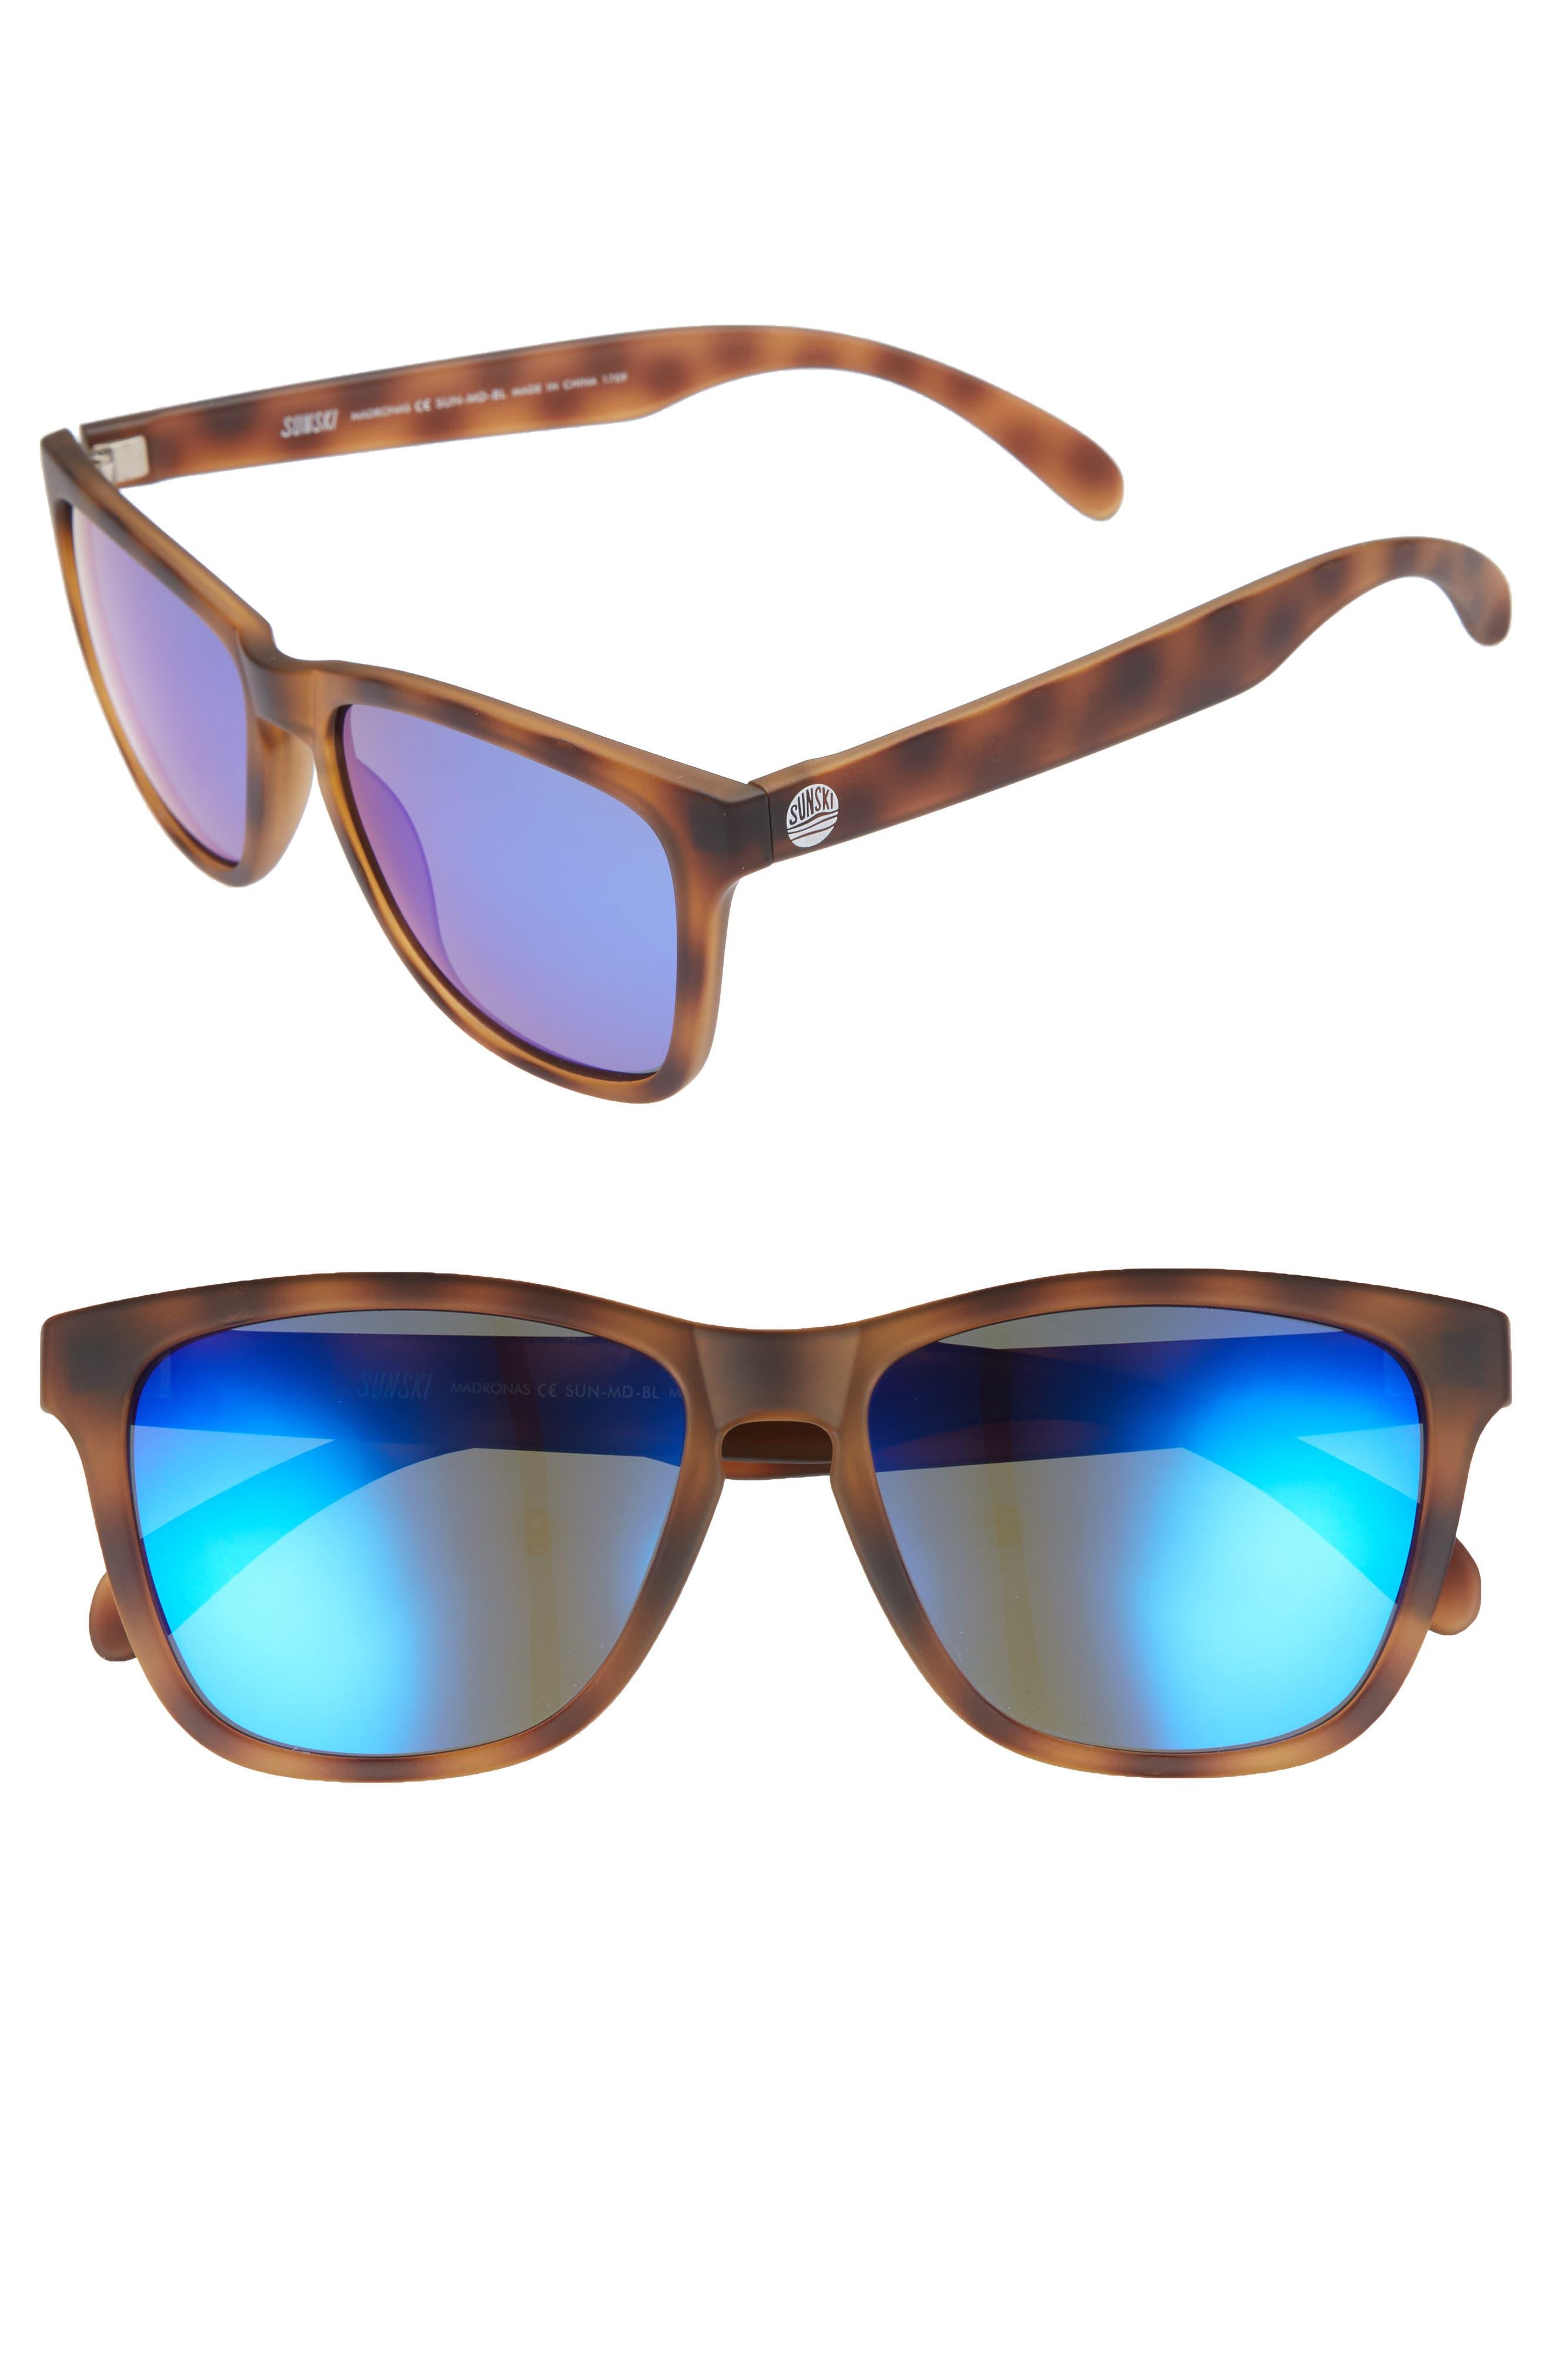 Madrona 53mm Polarized Sunglasses,                             Alternate thumbnail 2, color,                             TORTOISE/BLUE